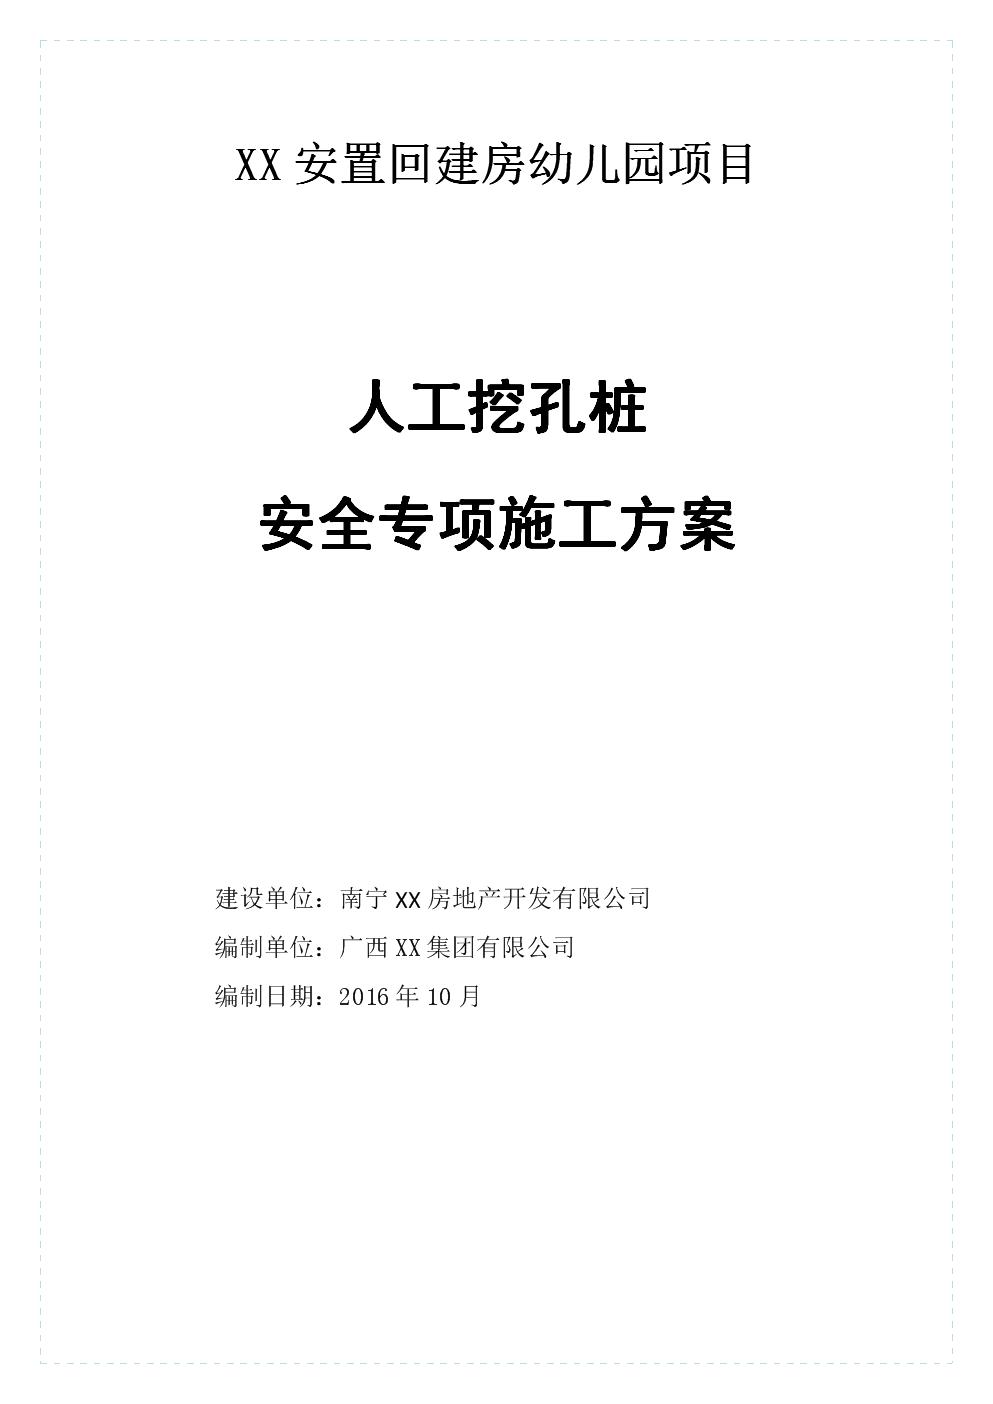 XX幼儿园人工挖孔桩施工方案(已审).doc